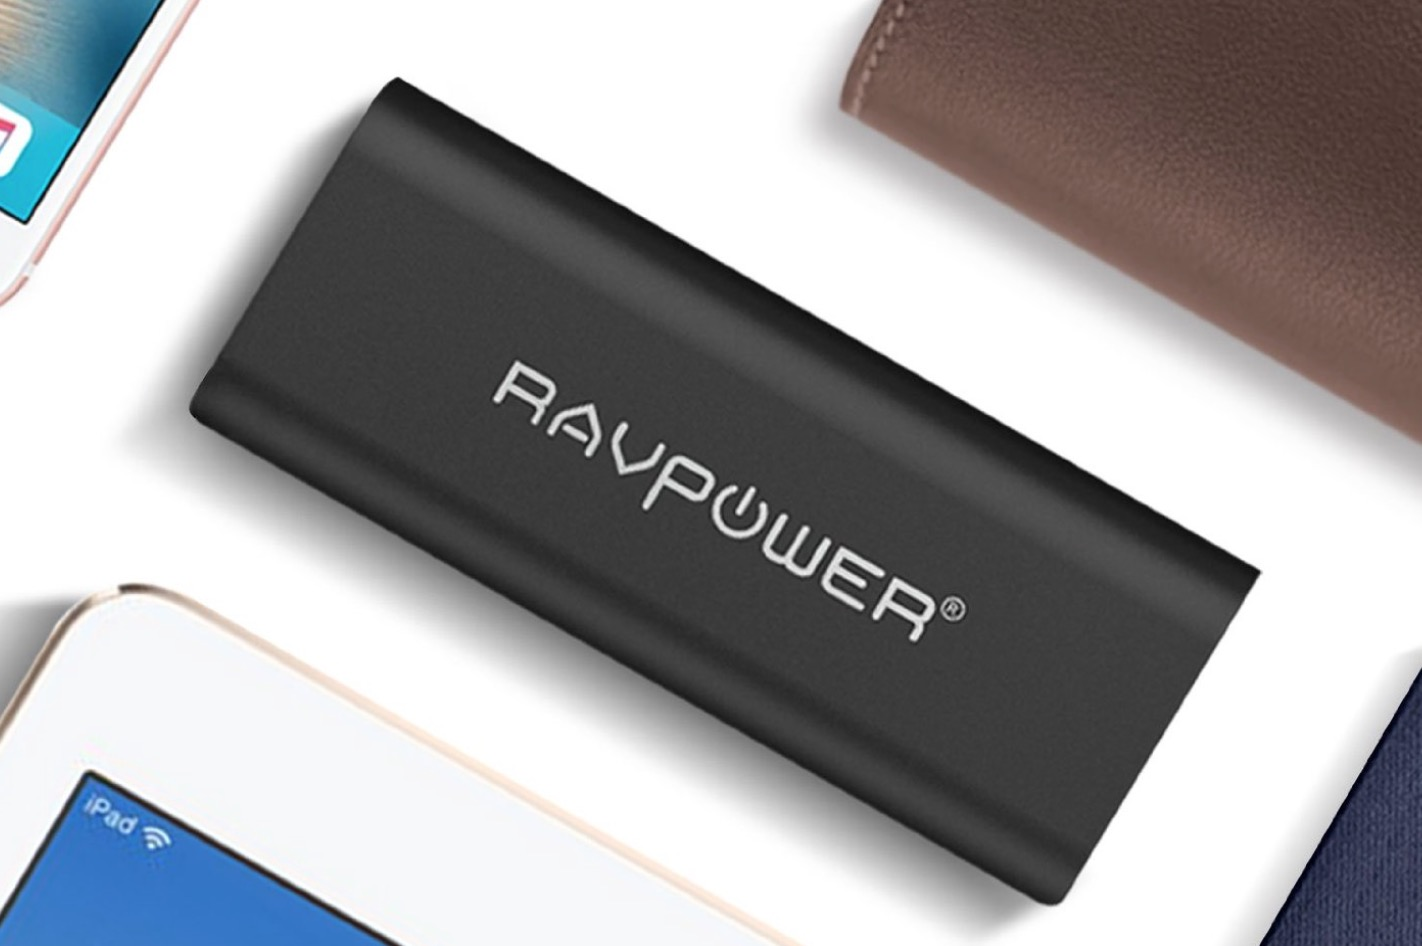 RAVPower caricabatterie 10400 mAh